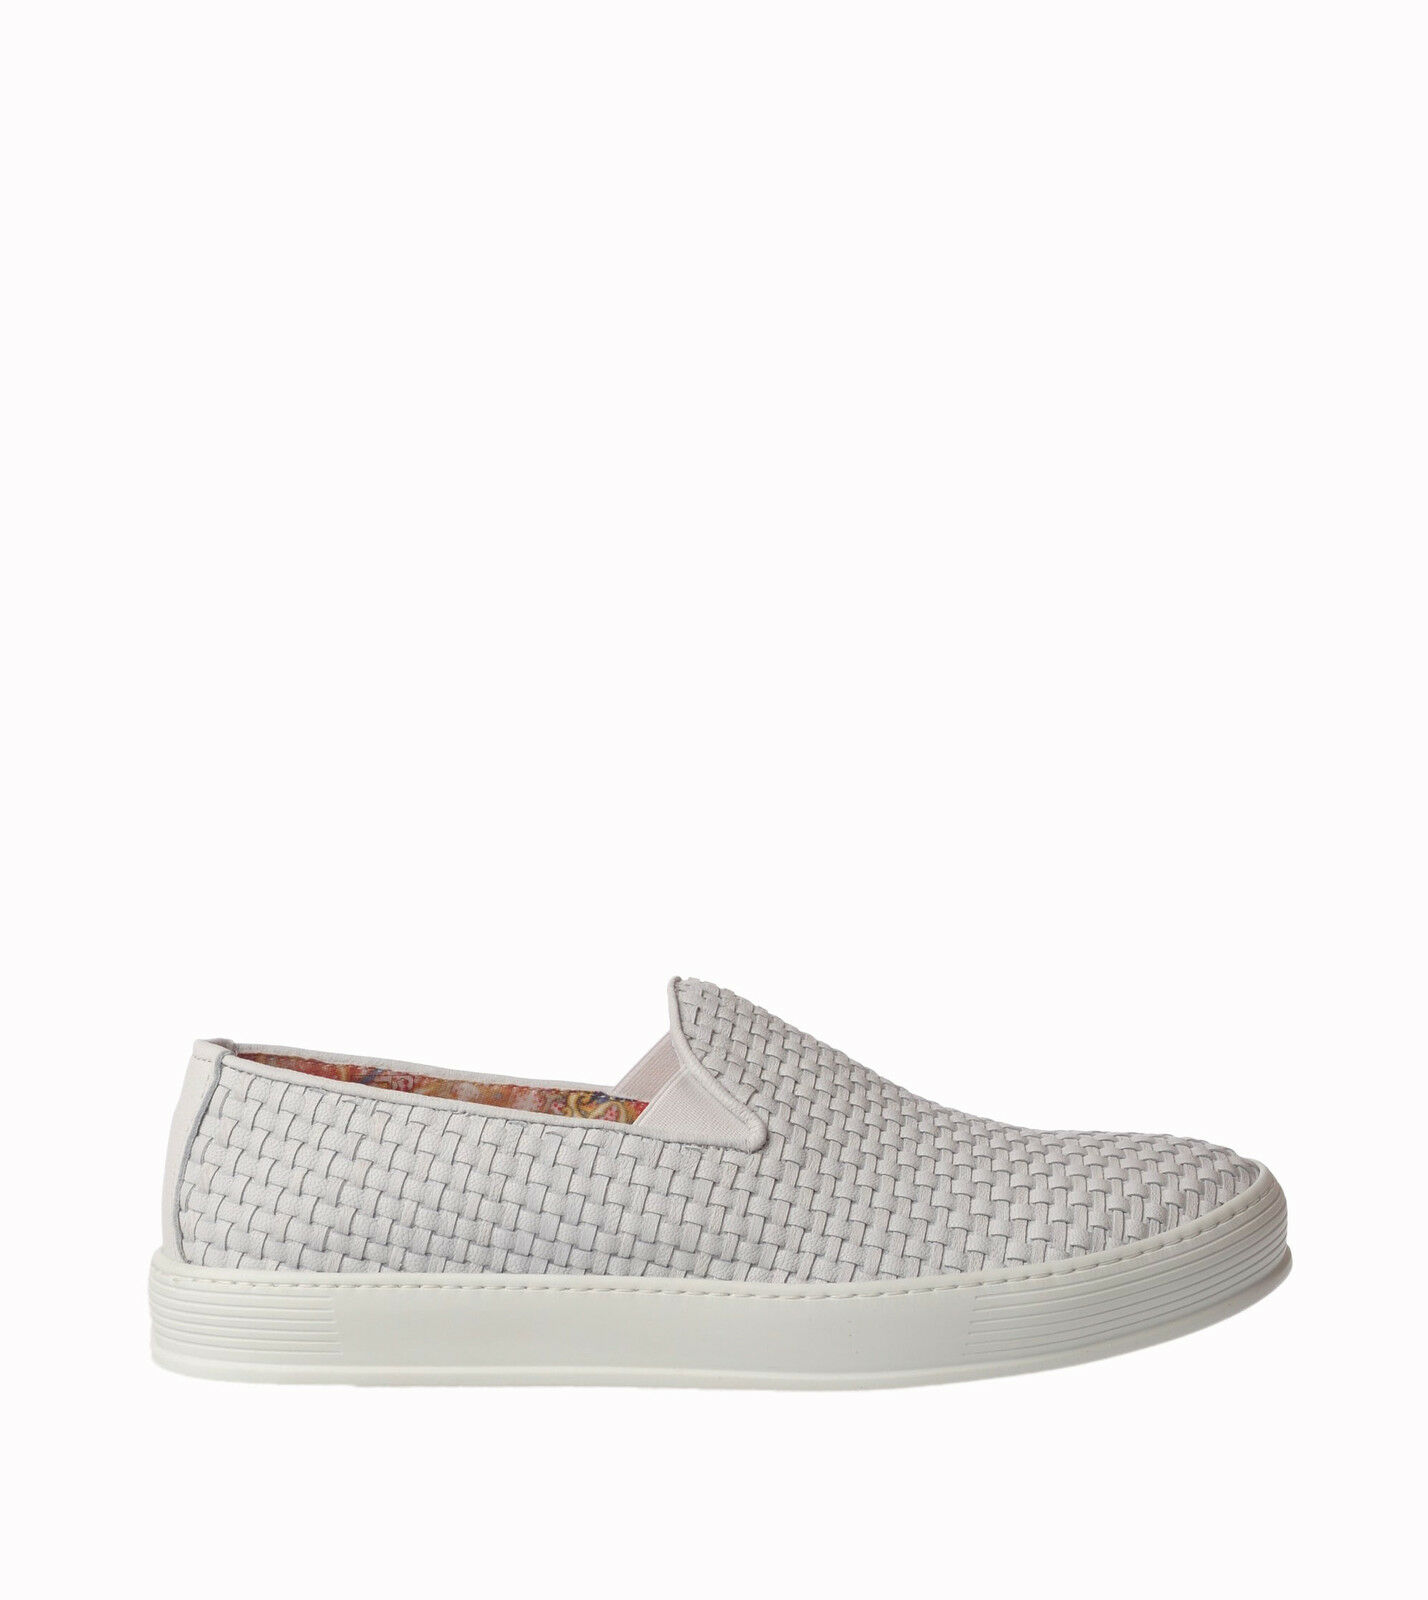 FLOW FLOW FLOW - scarpe-scarpe da ginnastica low - Man - bianca - 3699906G182054 58e14d